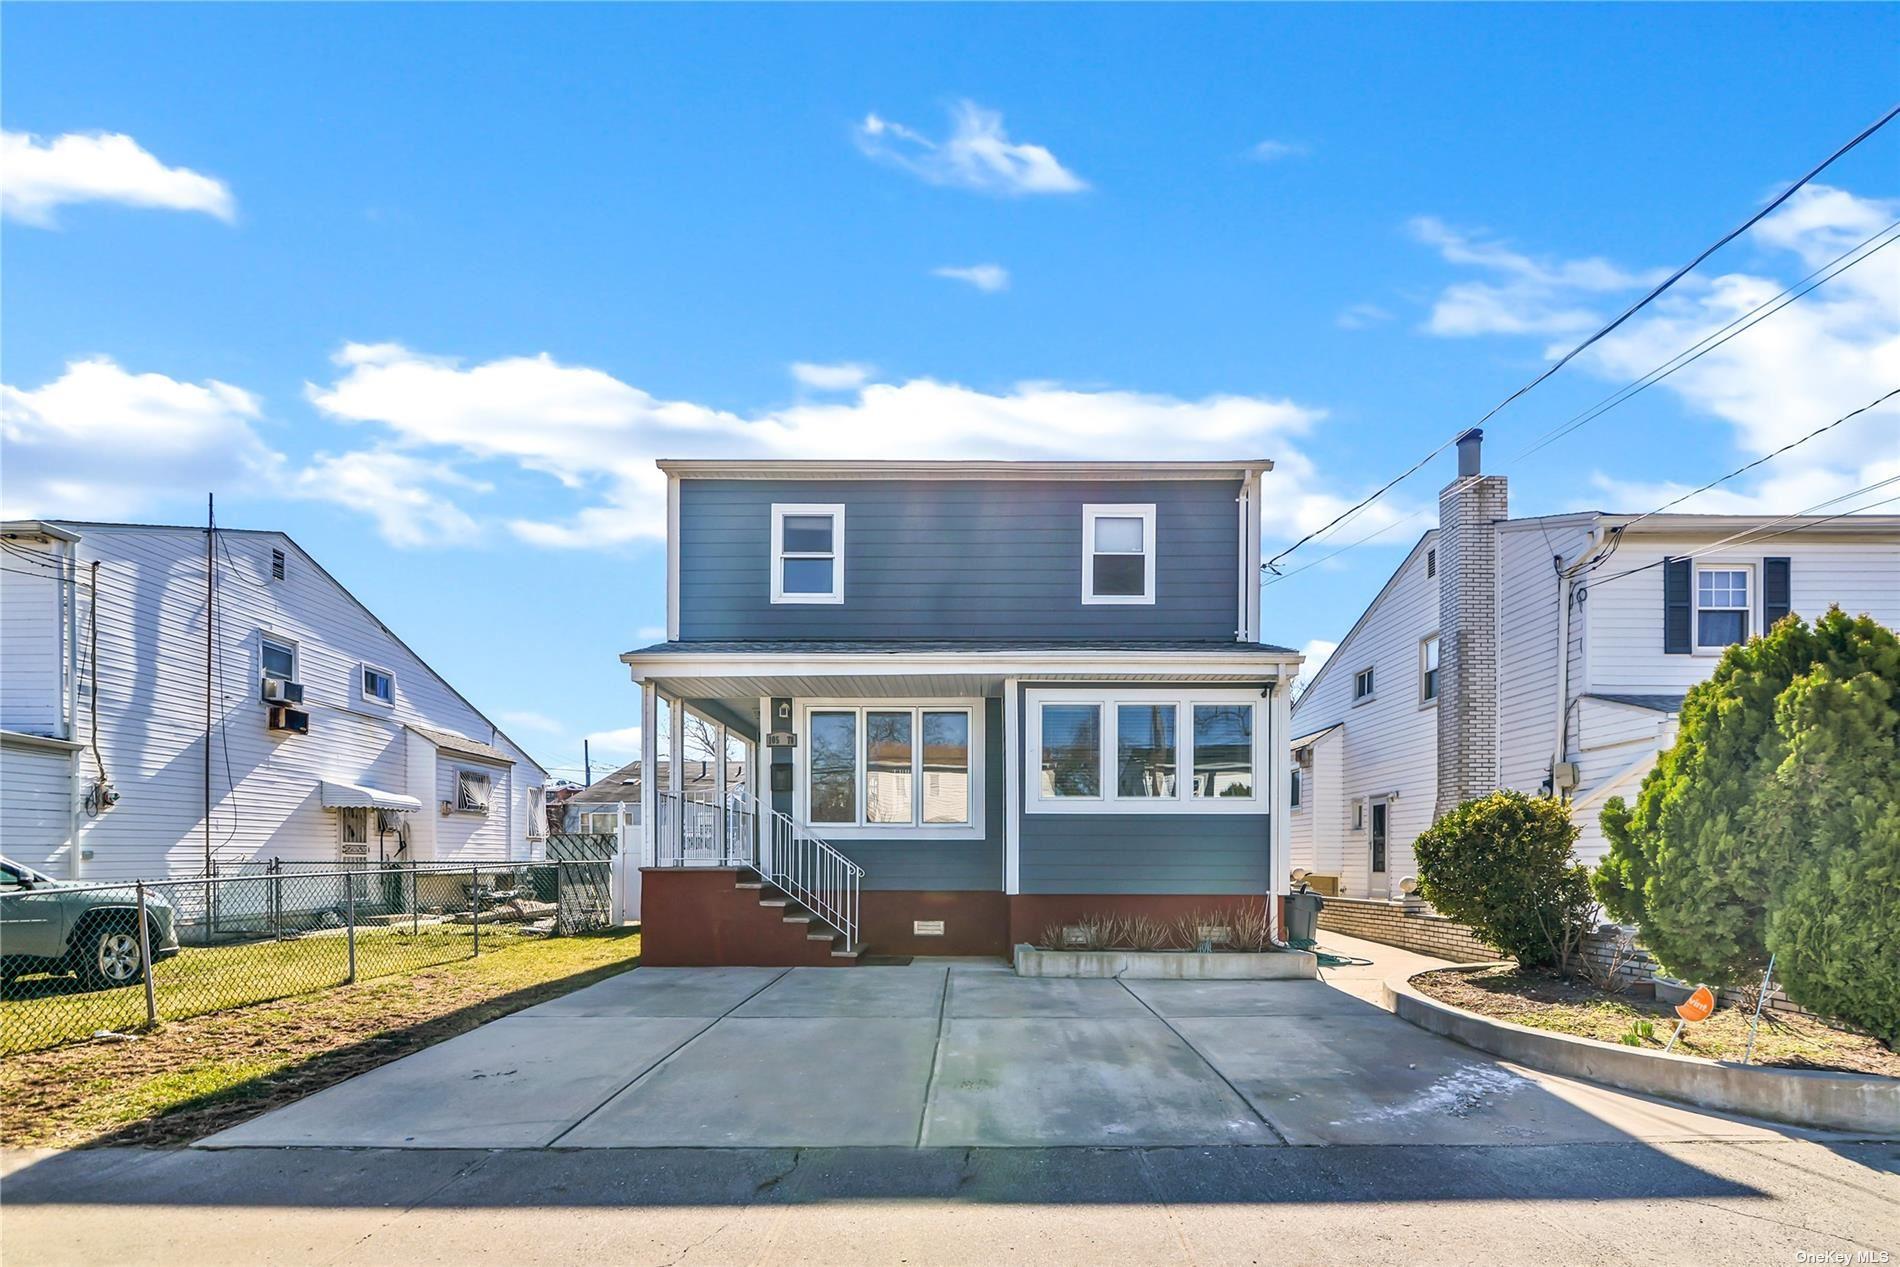 10578 Flatlands 9th Street, Canarsie, NY 11236 - MLS#: 3295033